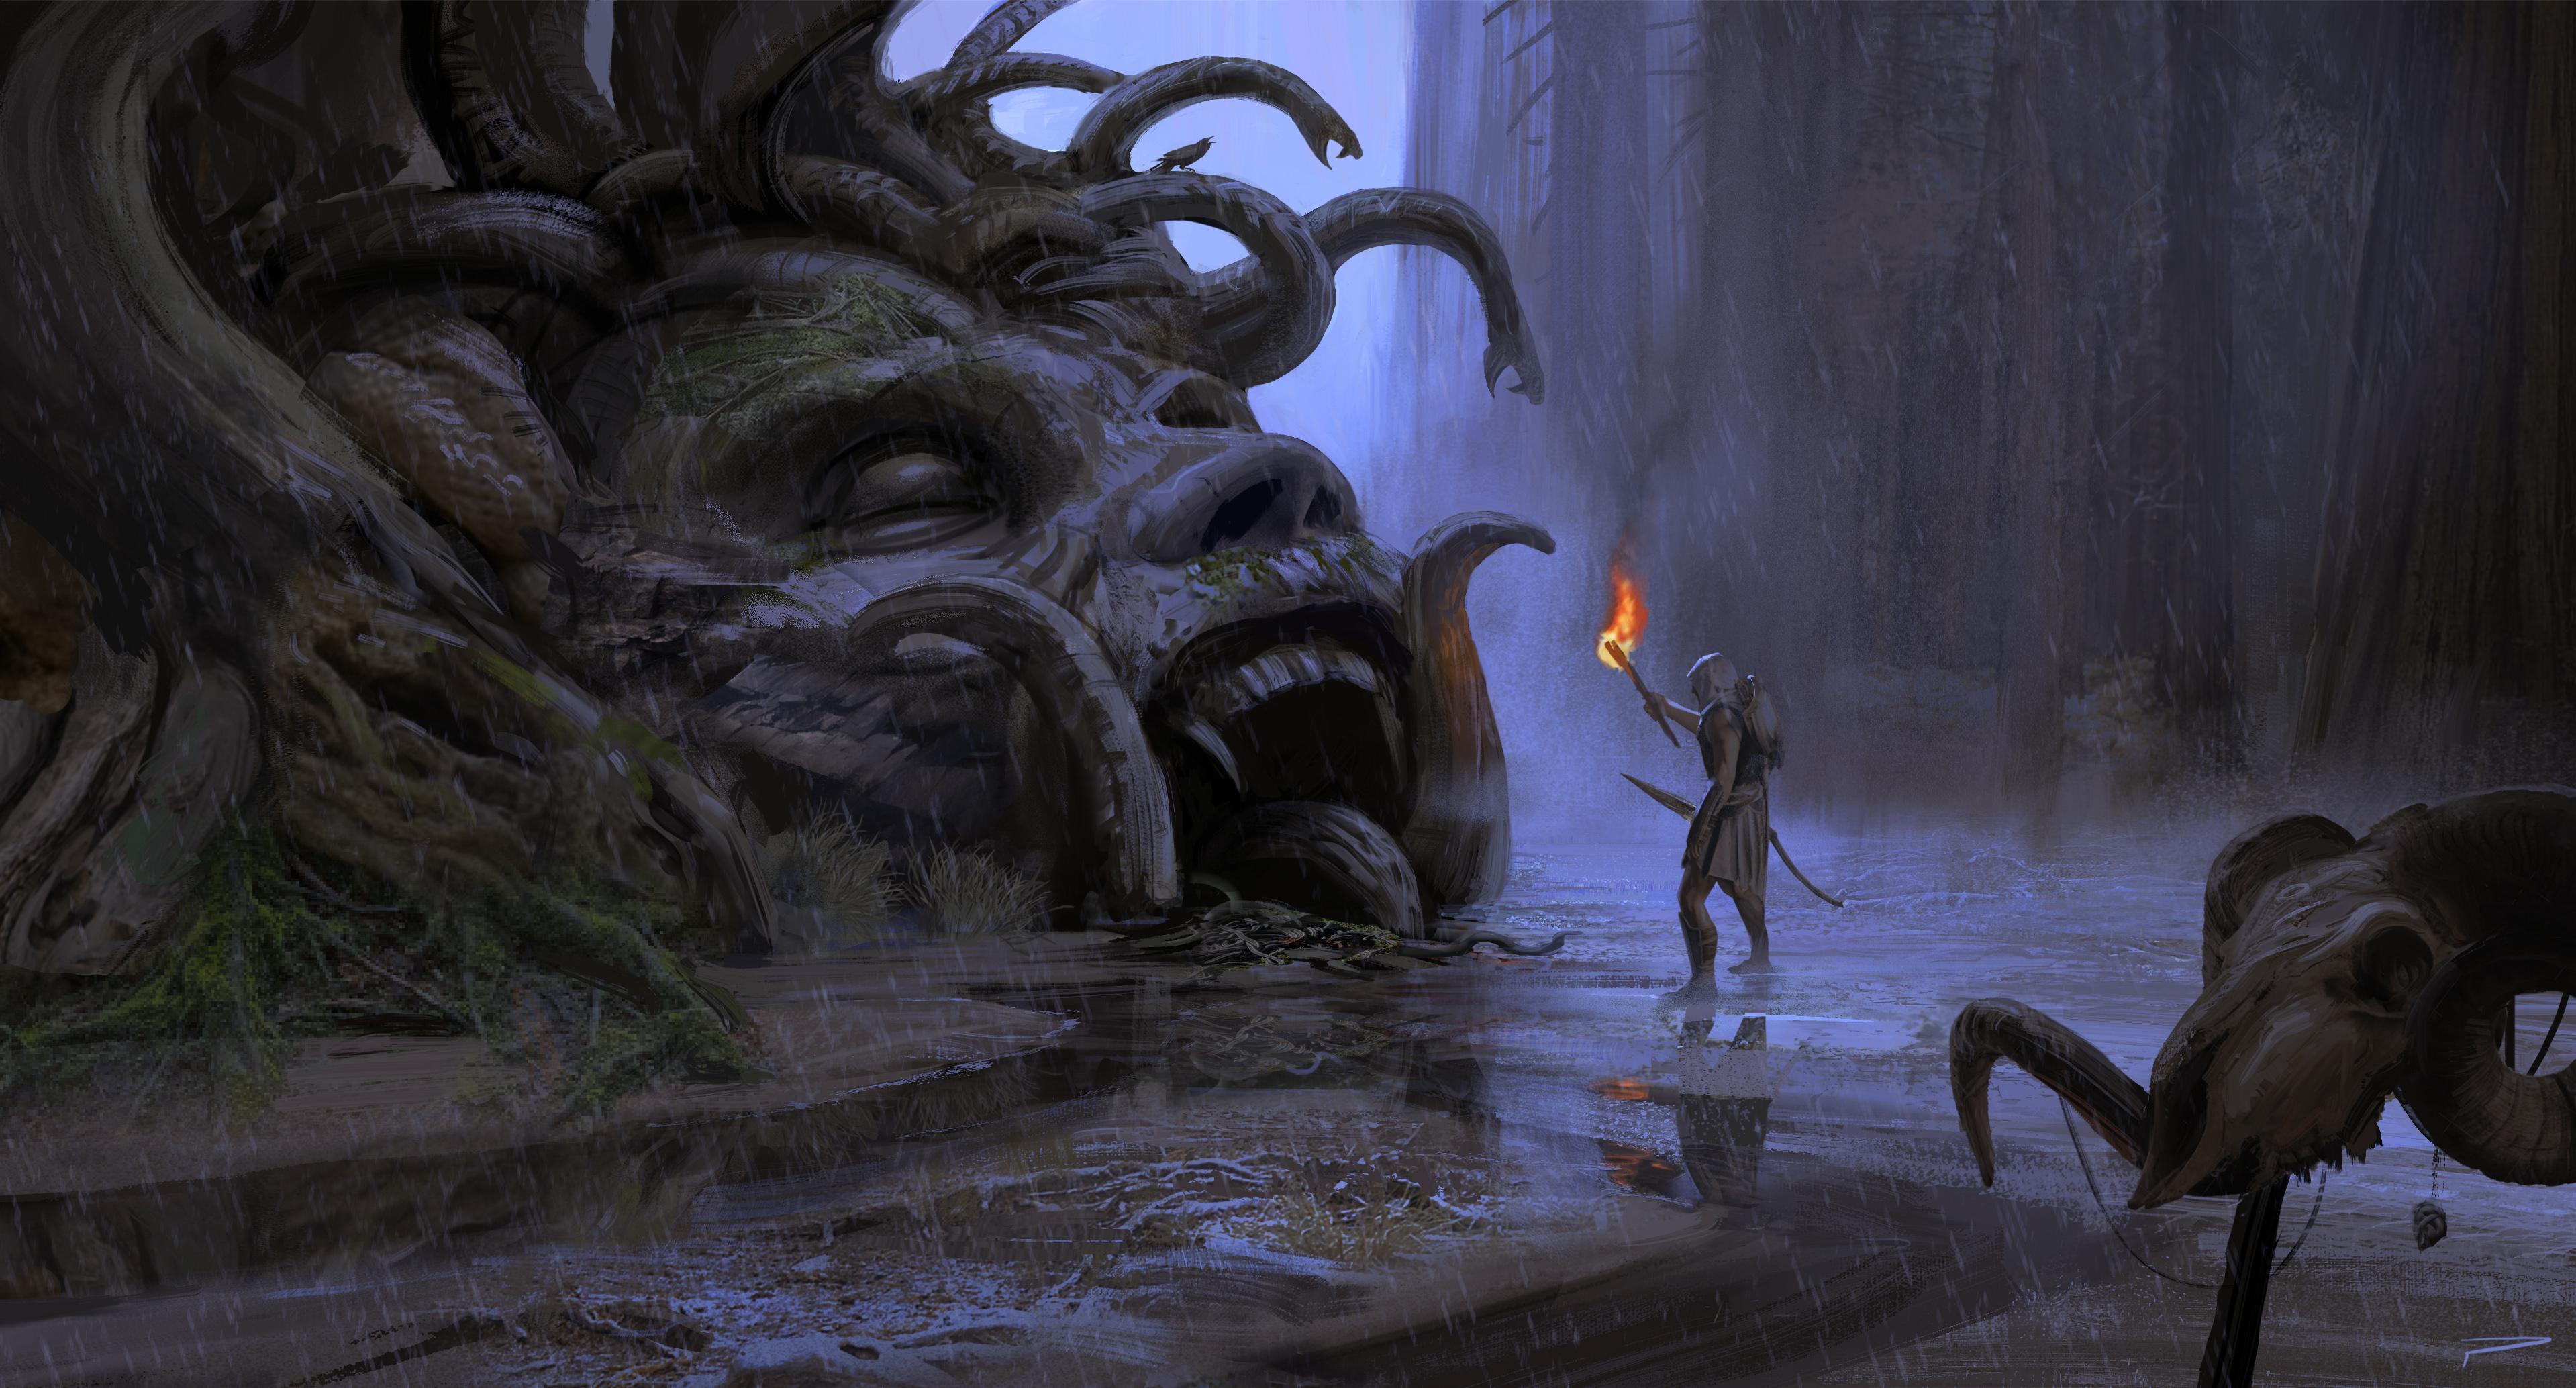 Cyclopean Head of Medusa